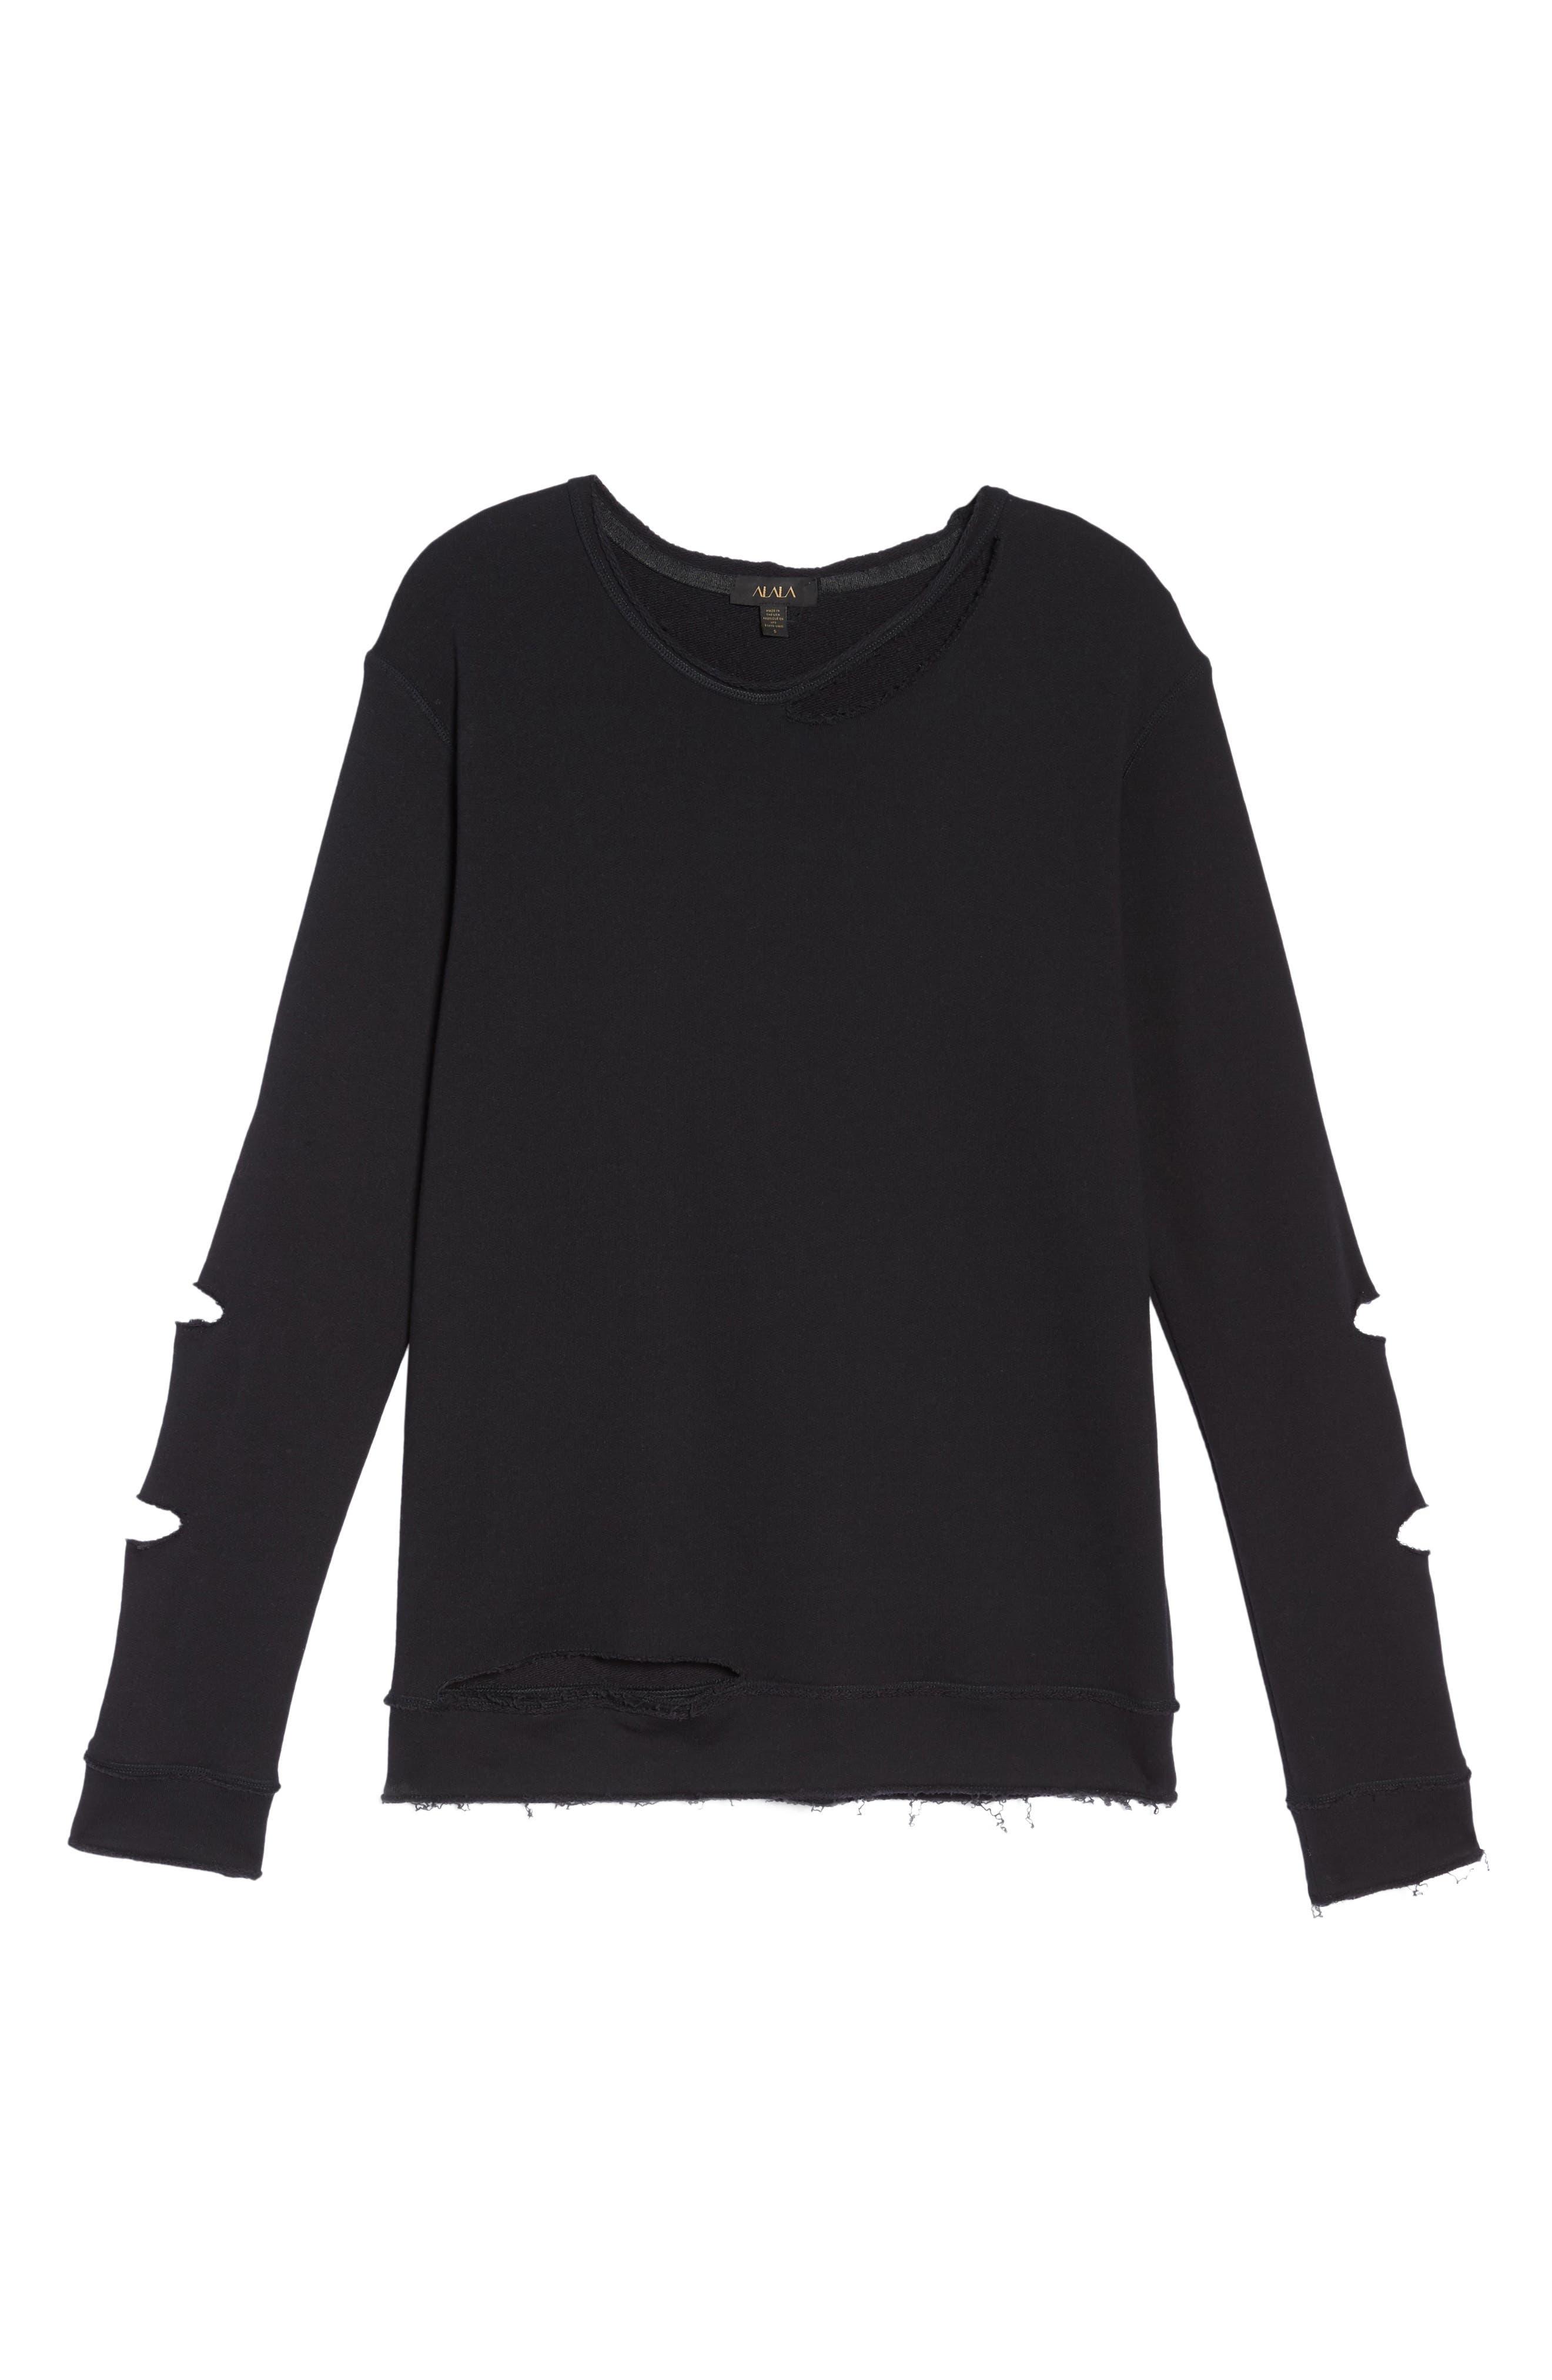 Cypher Destroyed Sweatshirt,                             Alternate thumbnail 7, color,                             BLACK